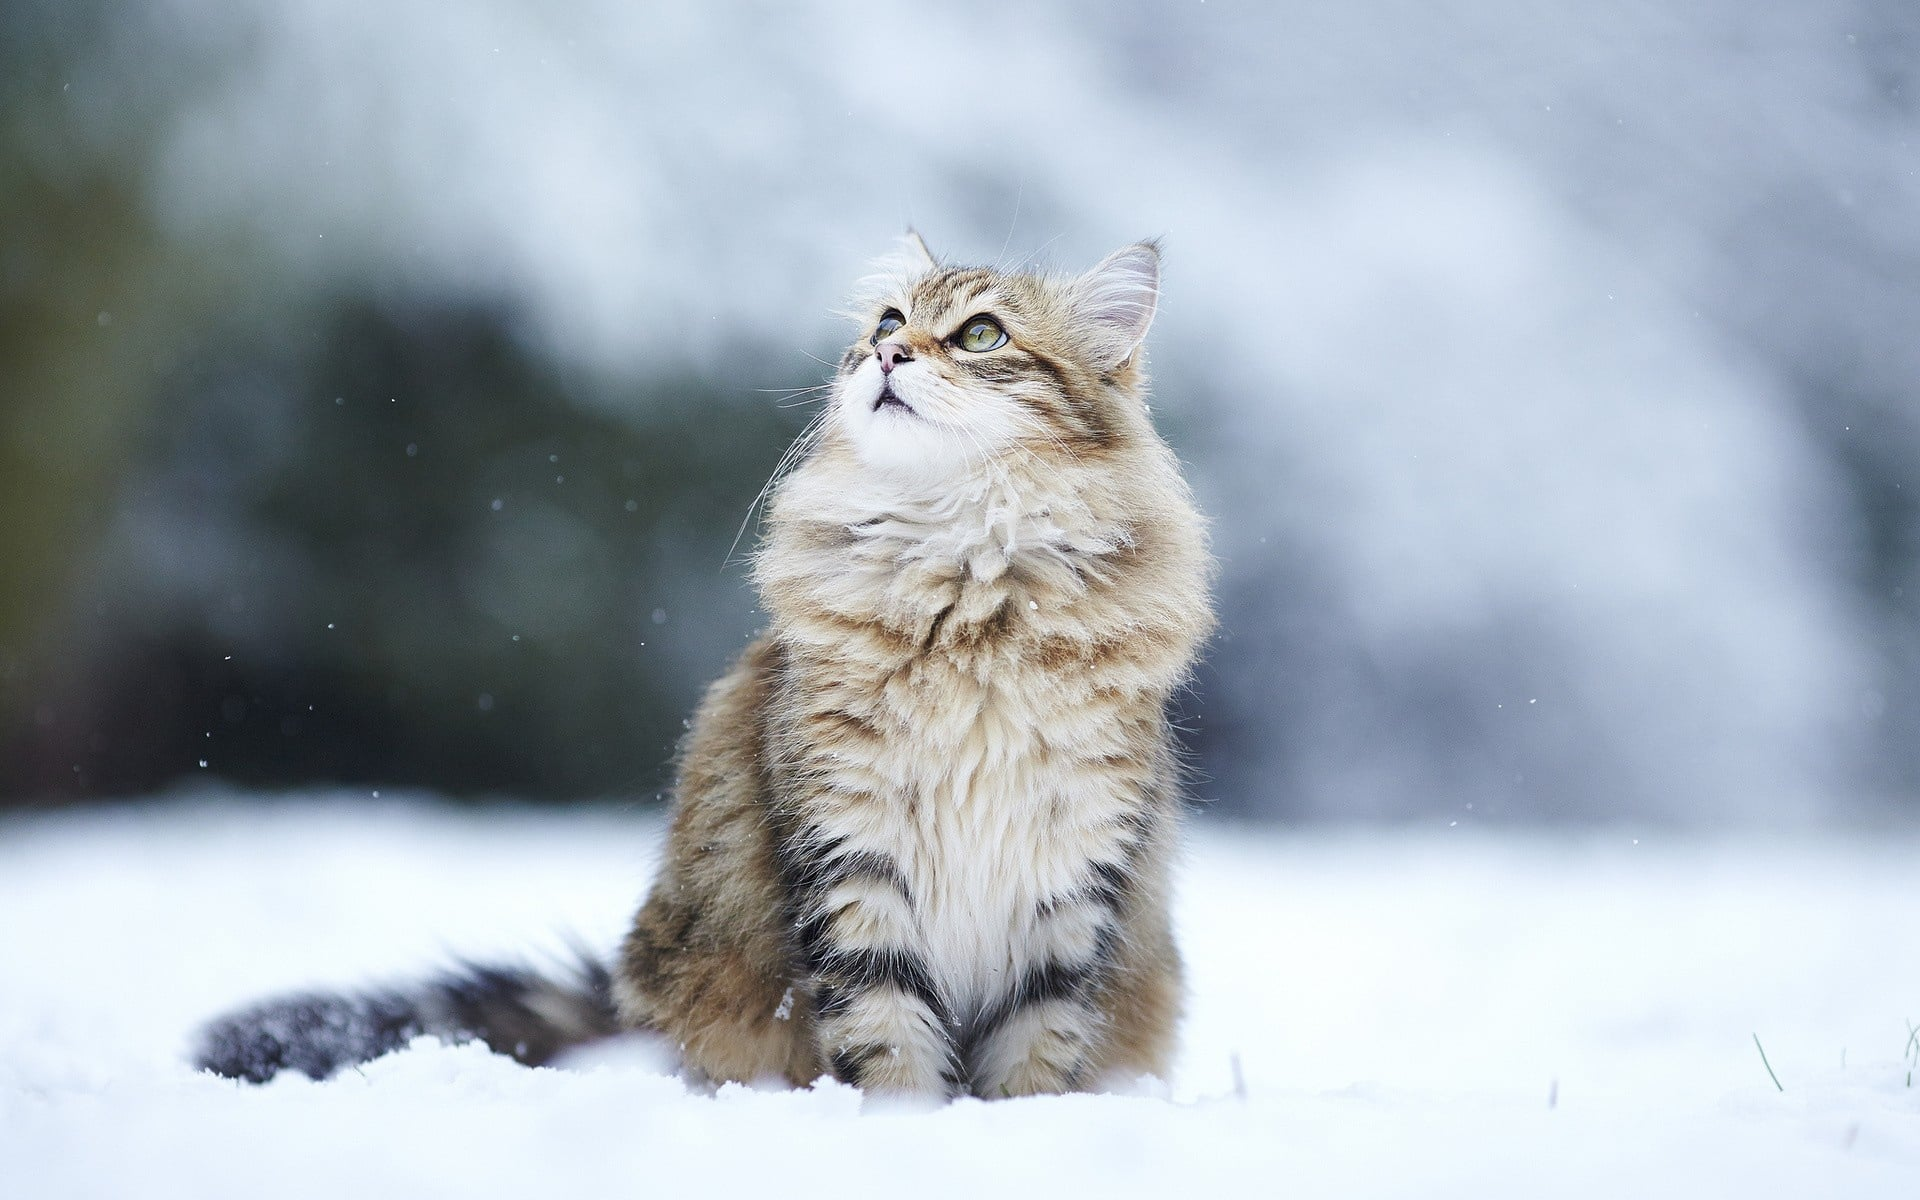 Hypoallergenic cat. Cat Breeds - photos, description 26